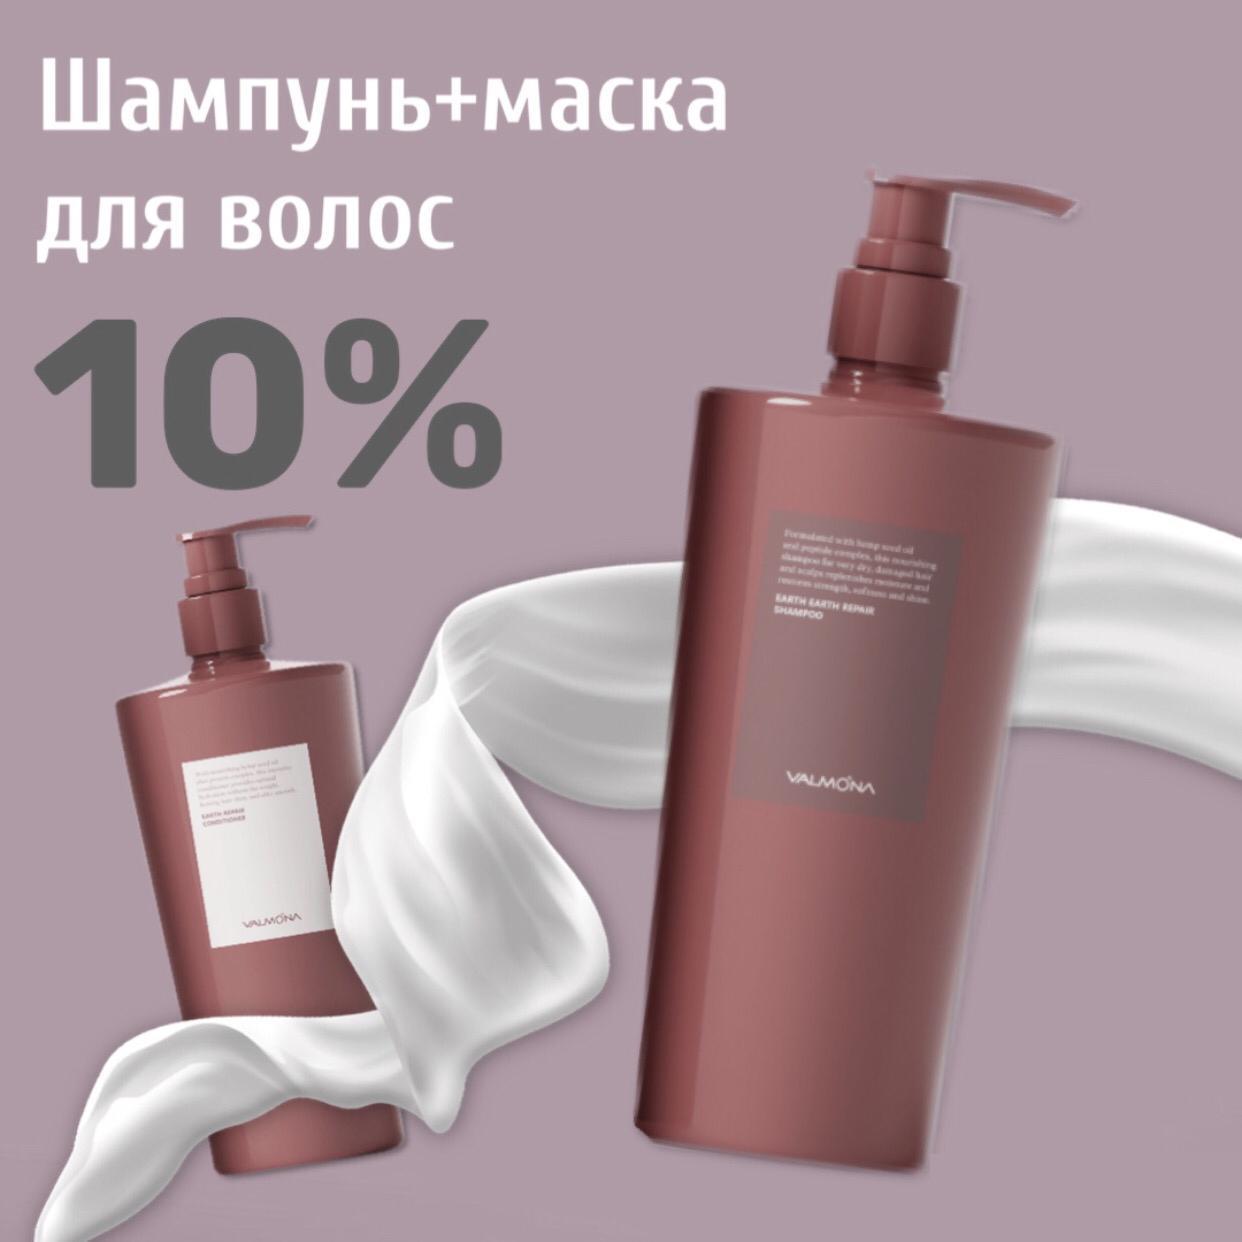 Акционные наборы Шампунь + маска для волос Valmona 10% WhatsApp_Image_2021-05-07_at_12.57.04_AM.jpeg